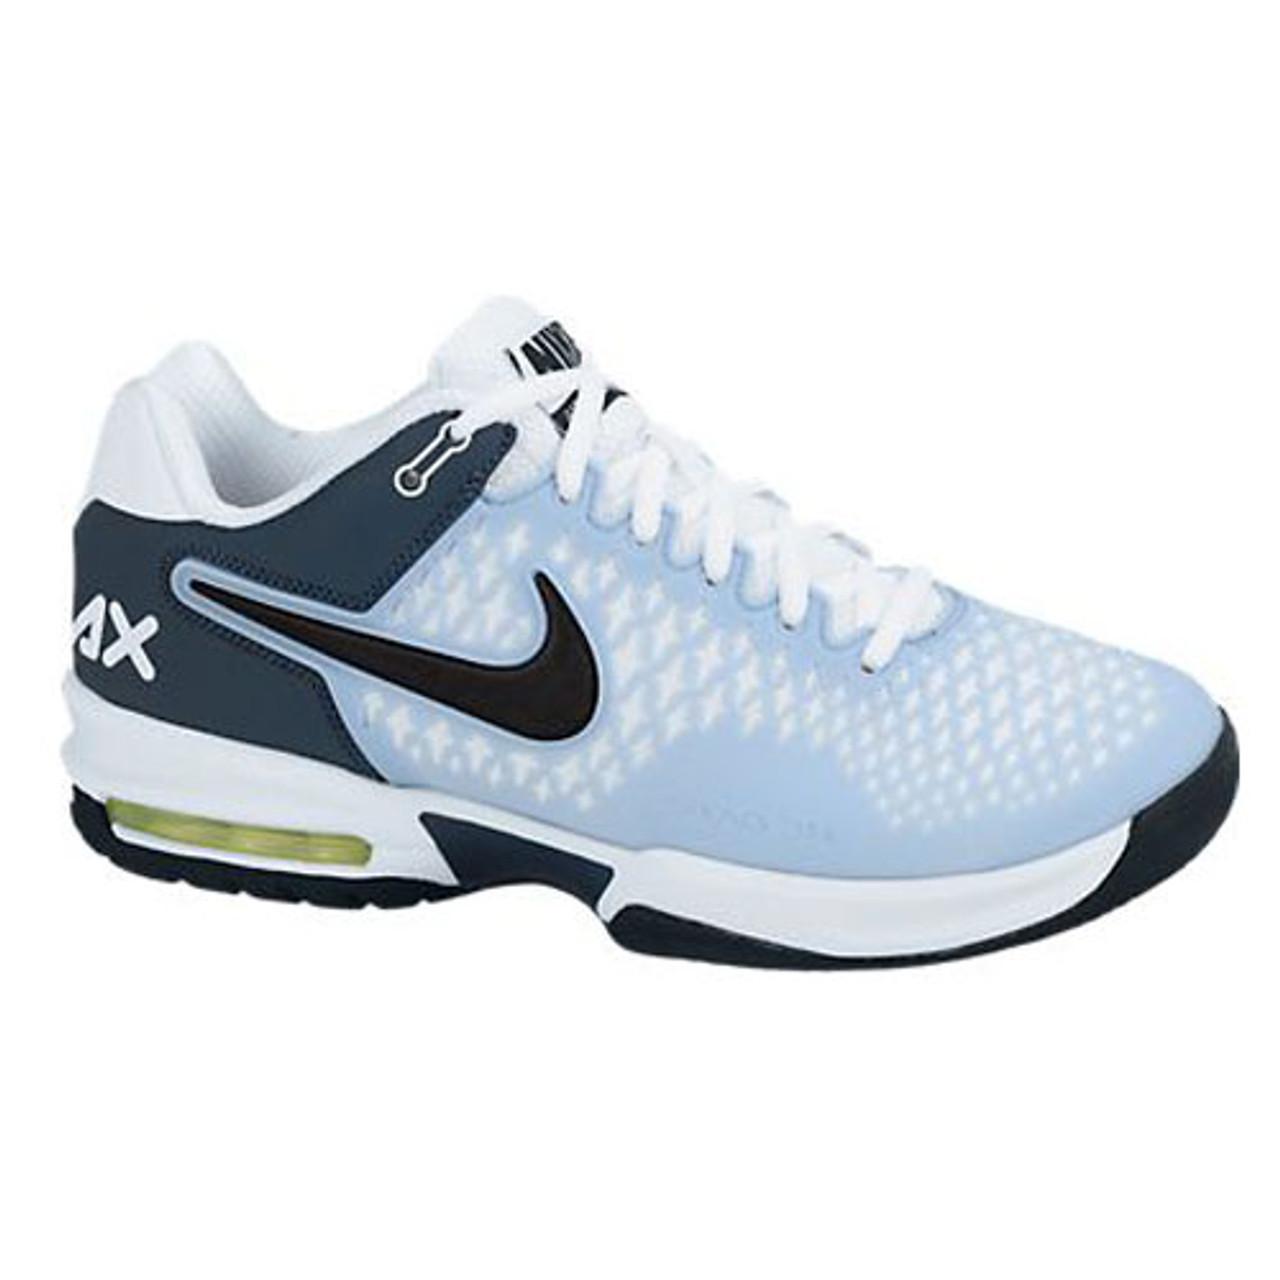 Nike Air Max Cage Light Blue Ladies Tennis Shoes